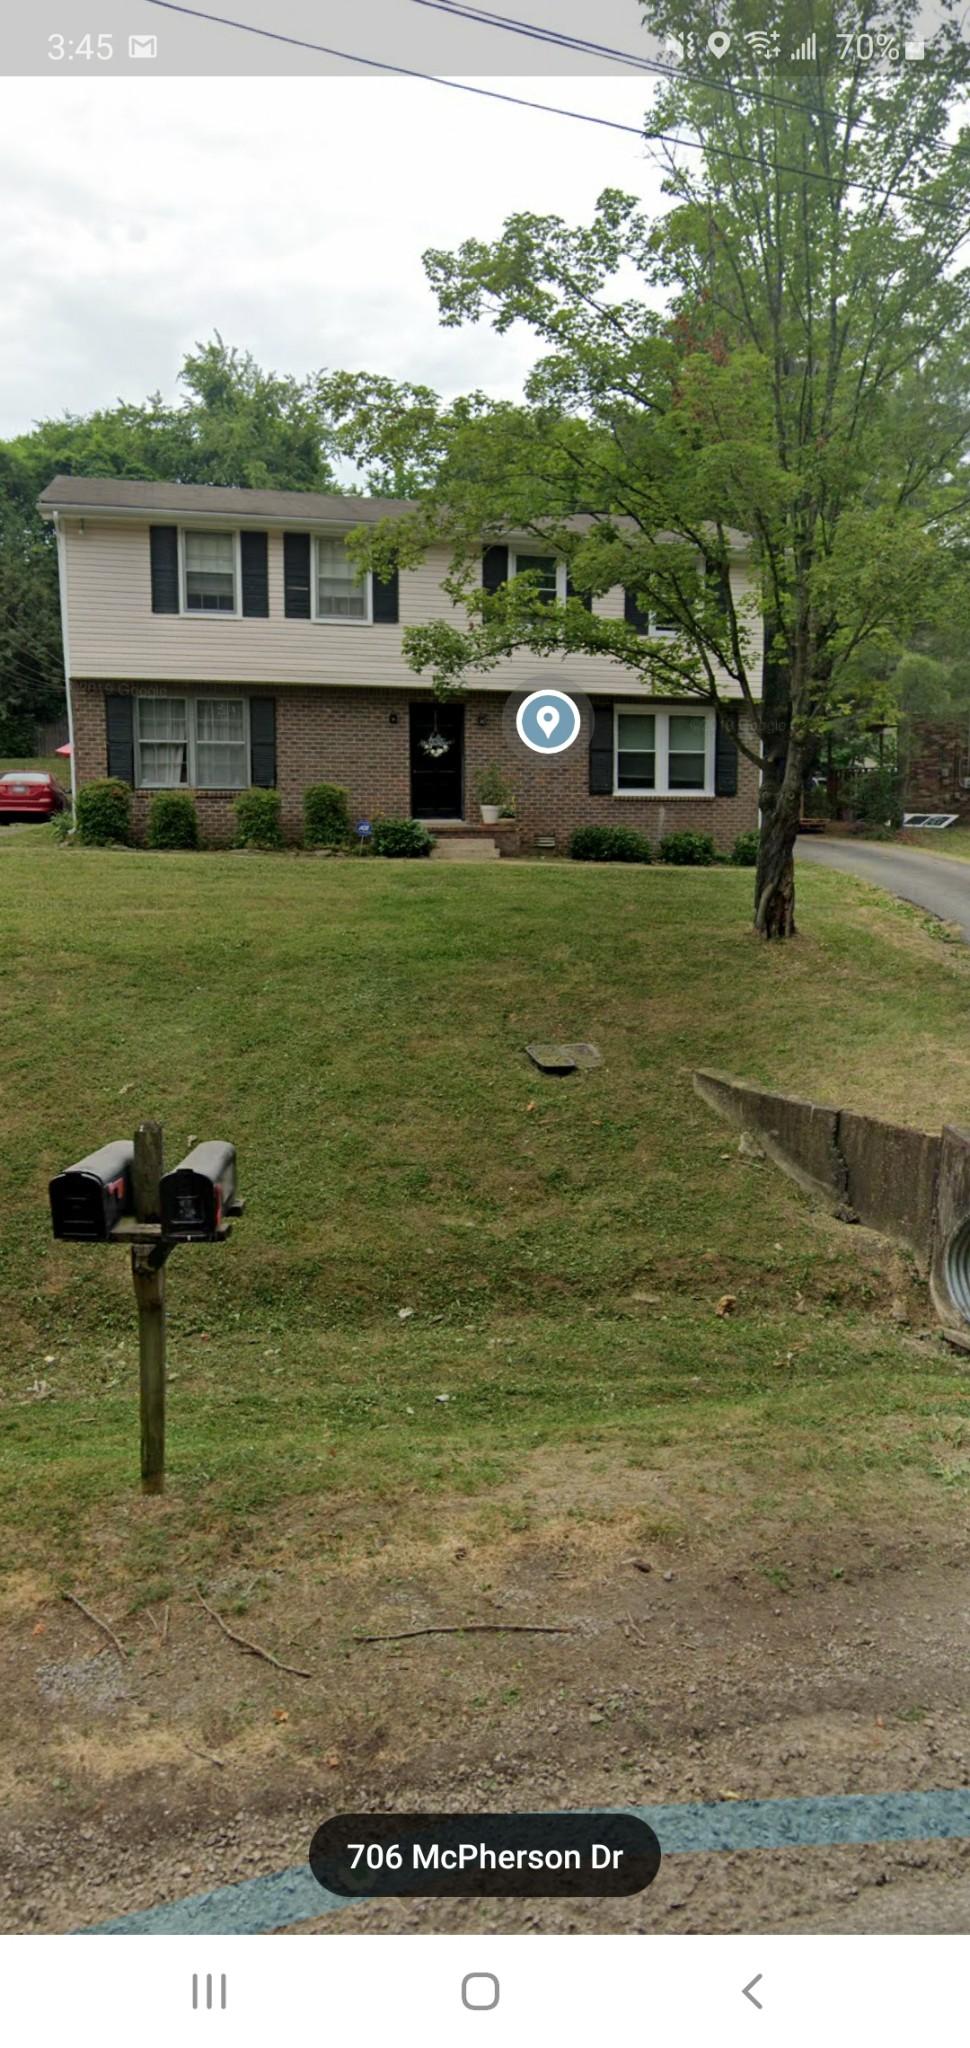 735 McPherson Dr Property Photo - Nashville, TN real estate listing